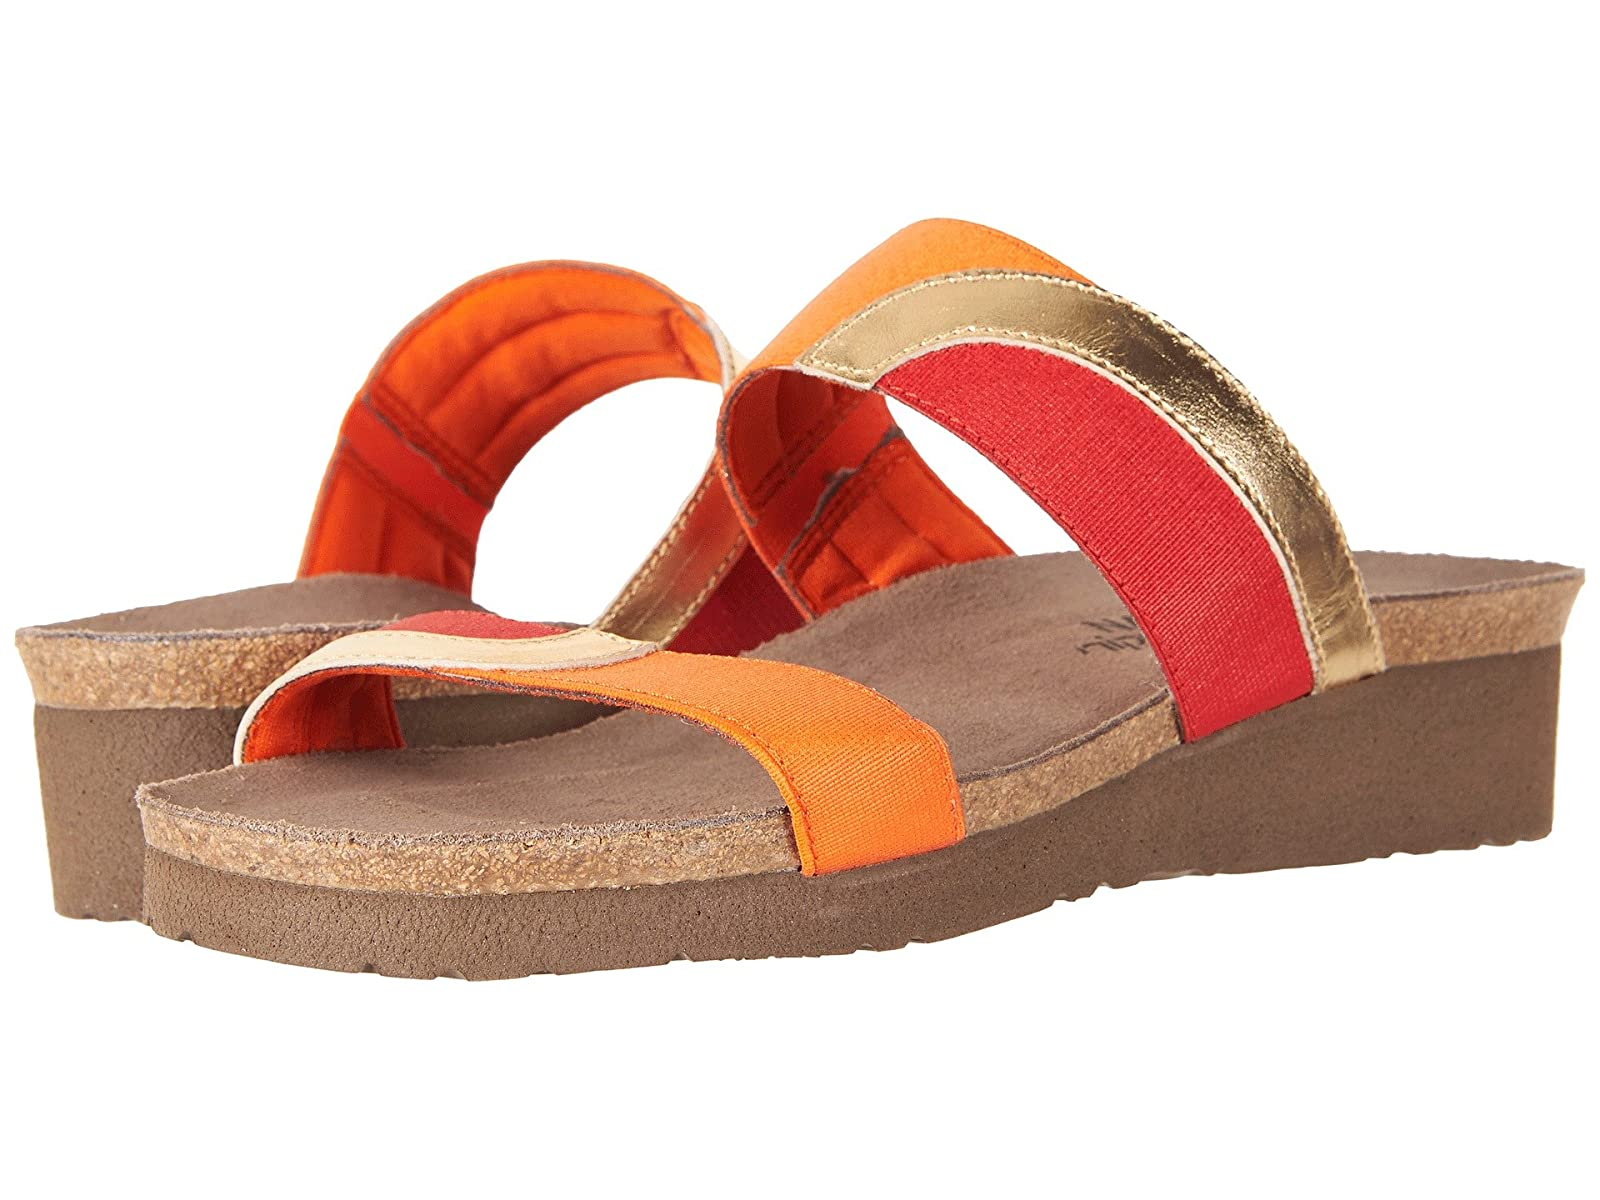 Naot FrankieAtmospheric grades have affordable shoes